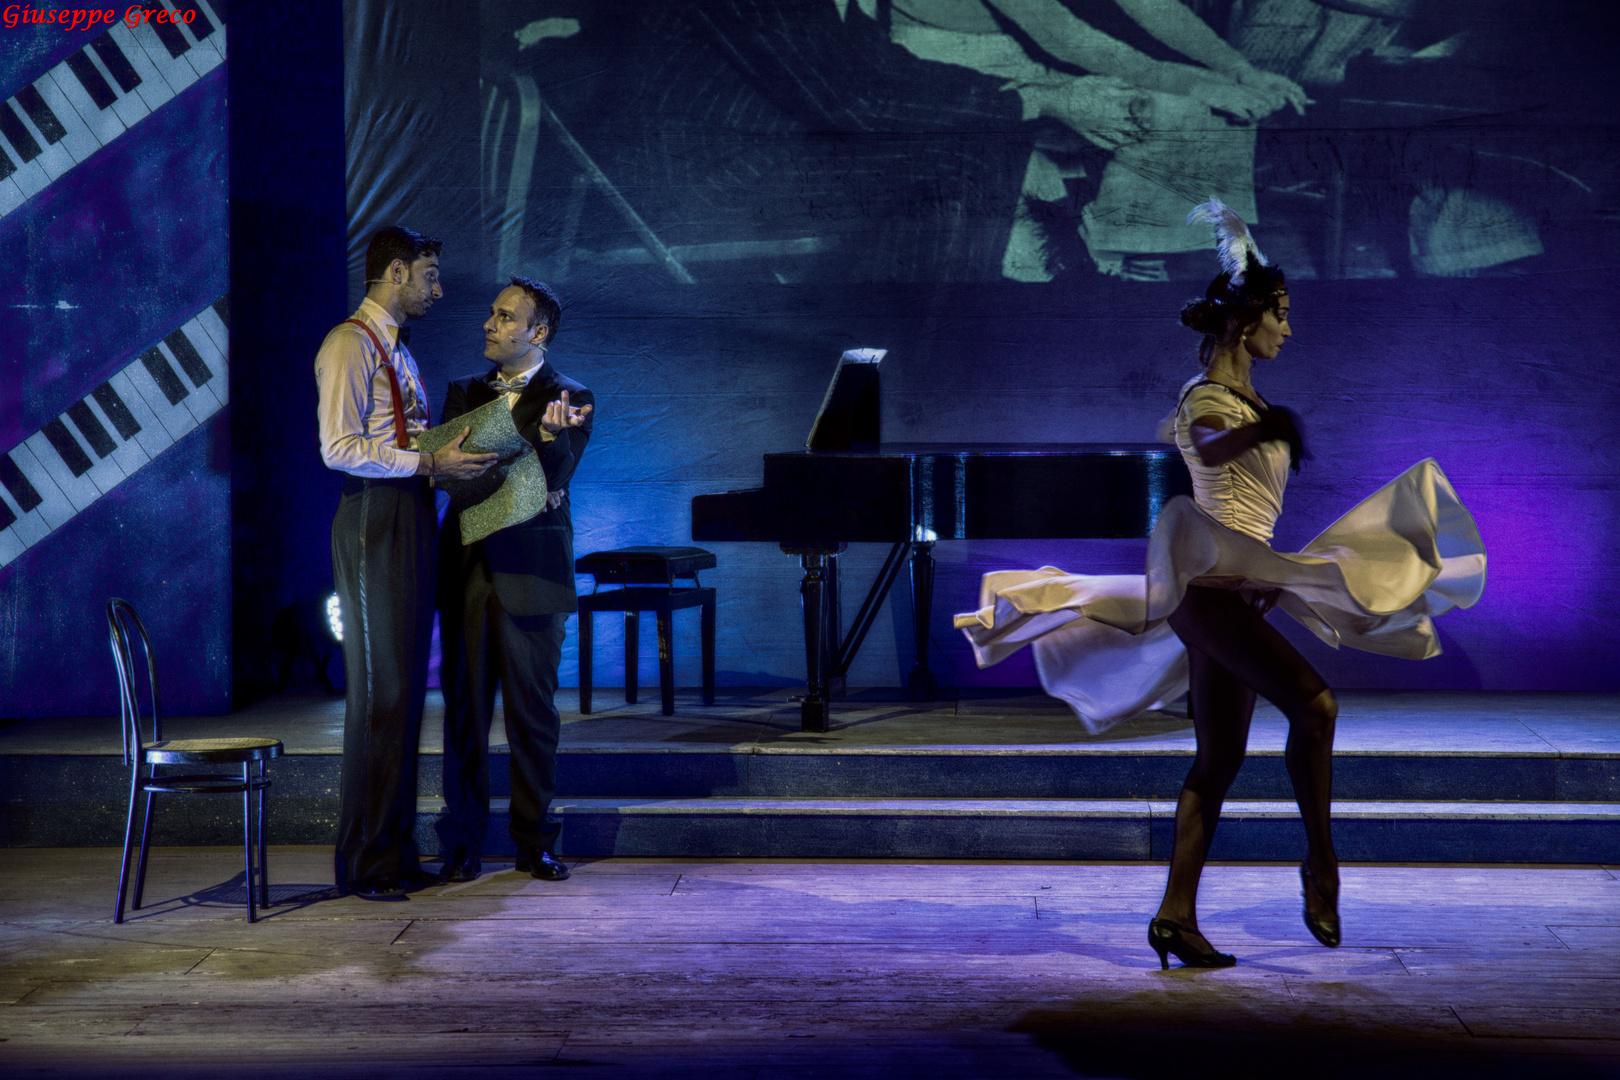 scene da un musical